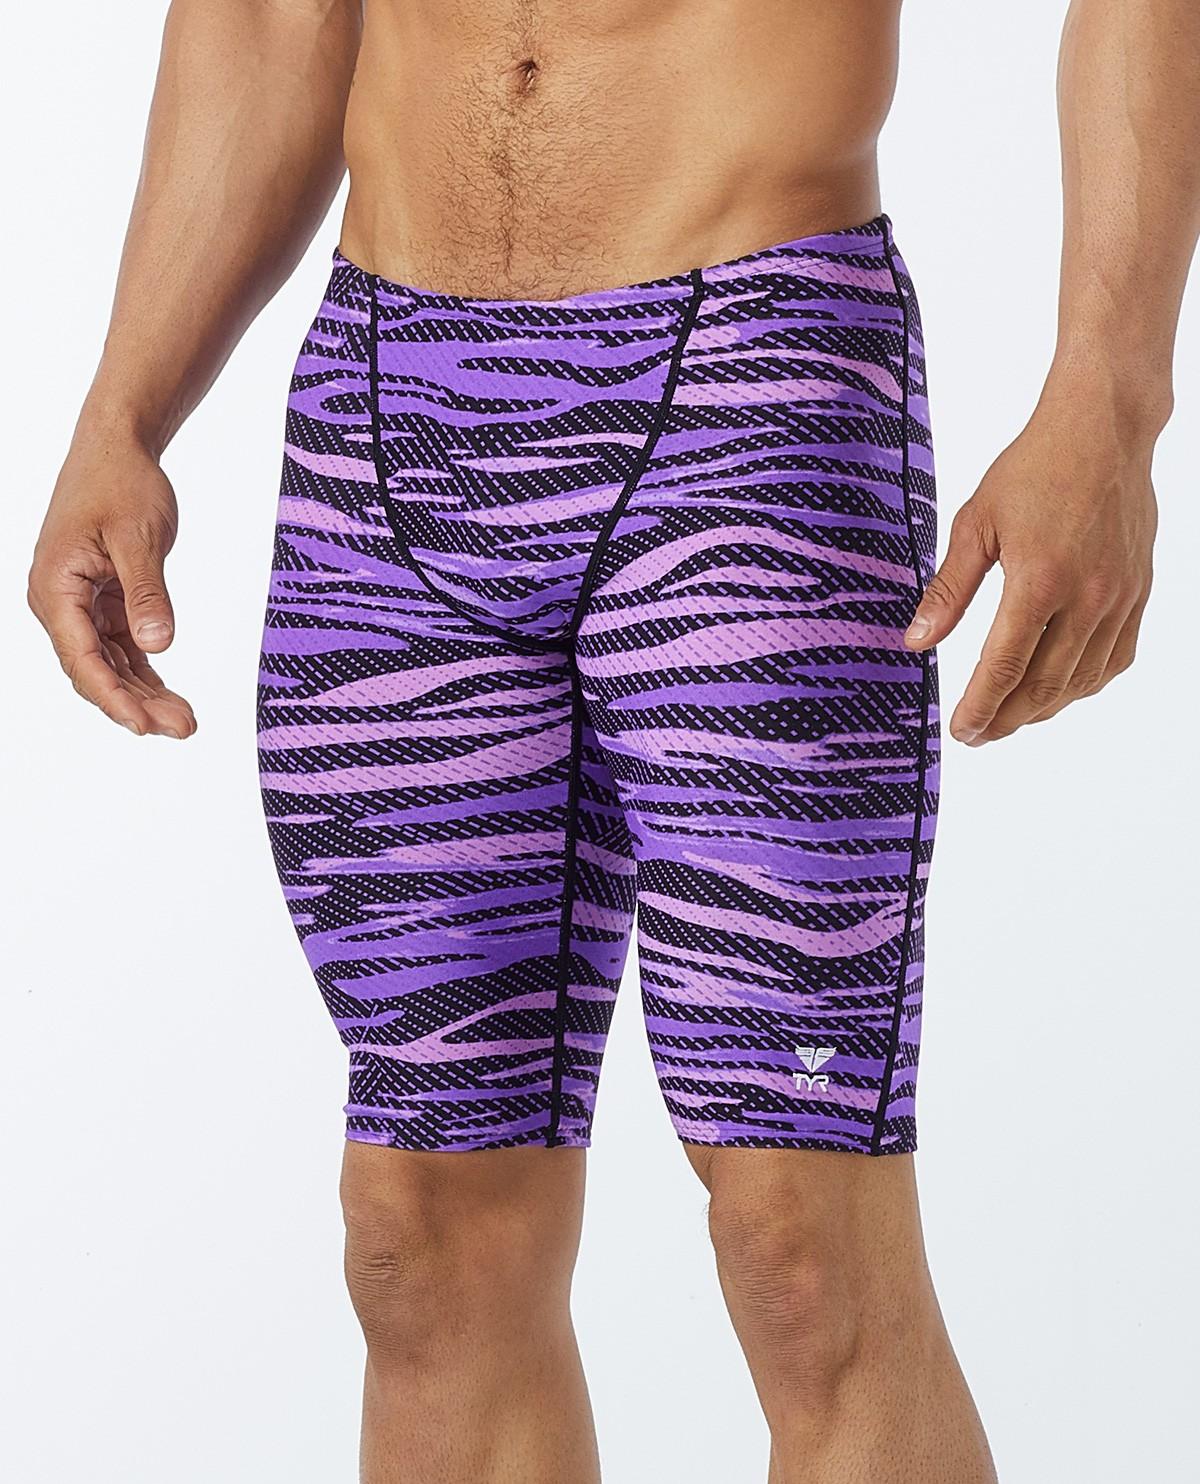 37c244b643 TYR Men's Crypsis Jammer Swimsuit   TYR